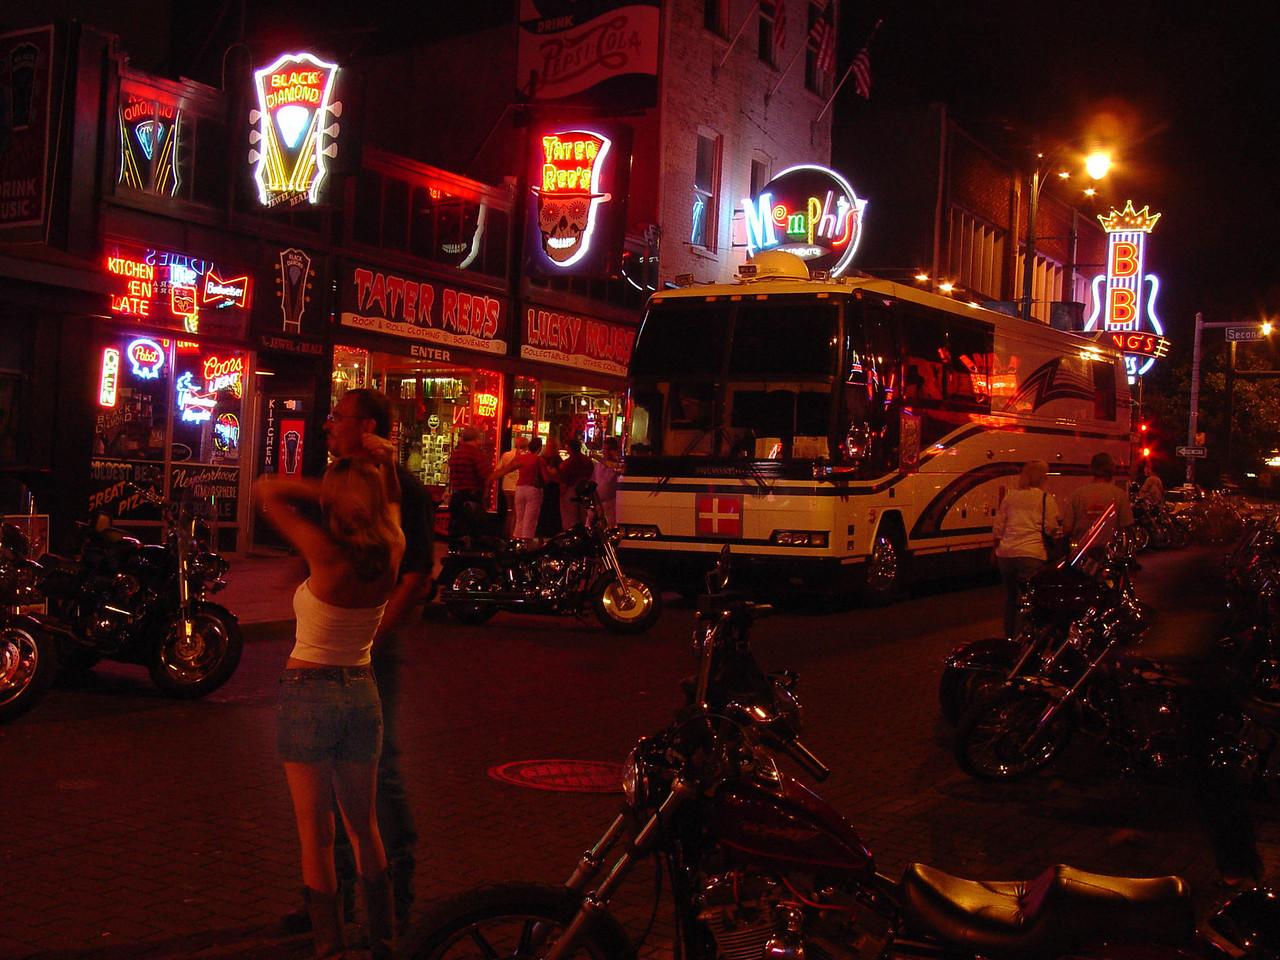 Beale Street in Memphis - August 2006